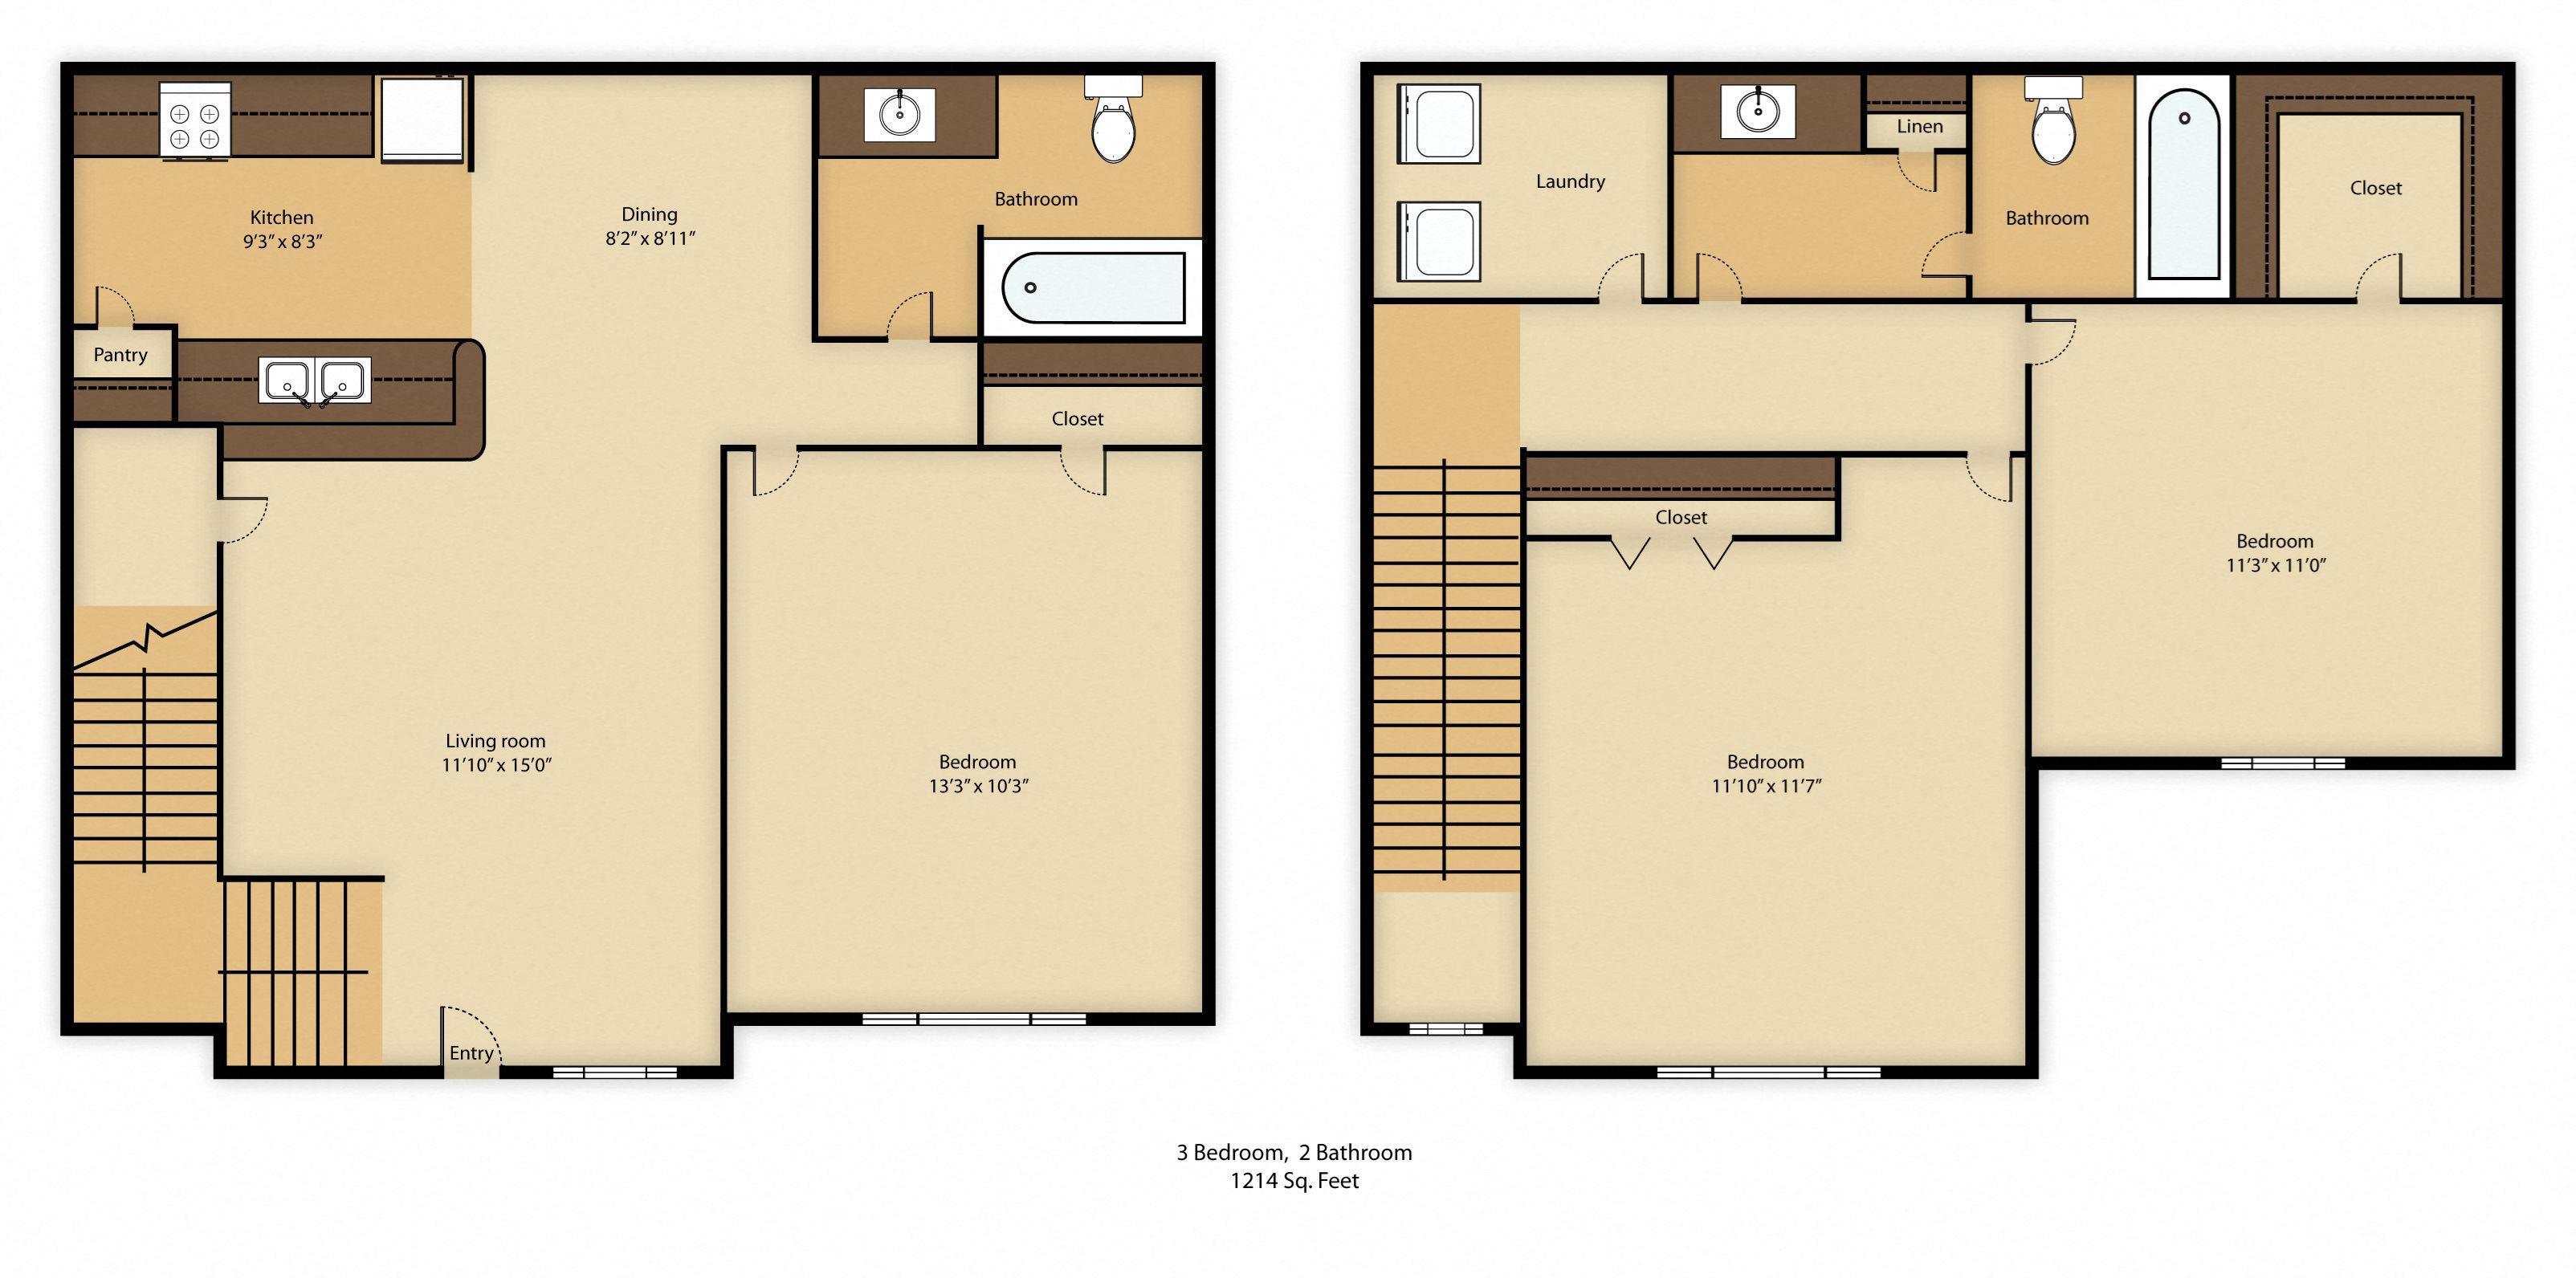 bedroom tx ridge dallas apartments forest